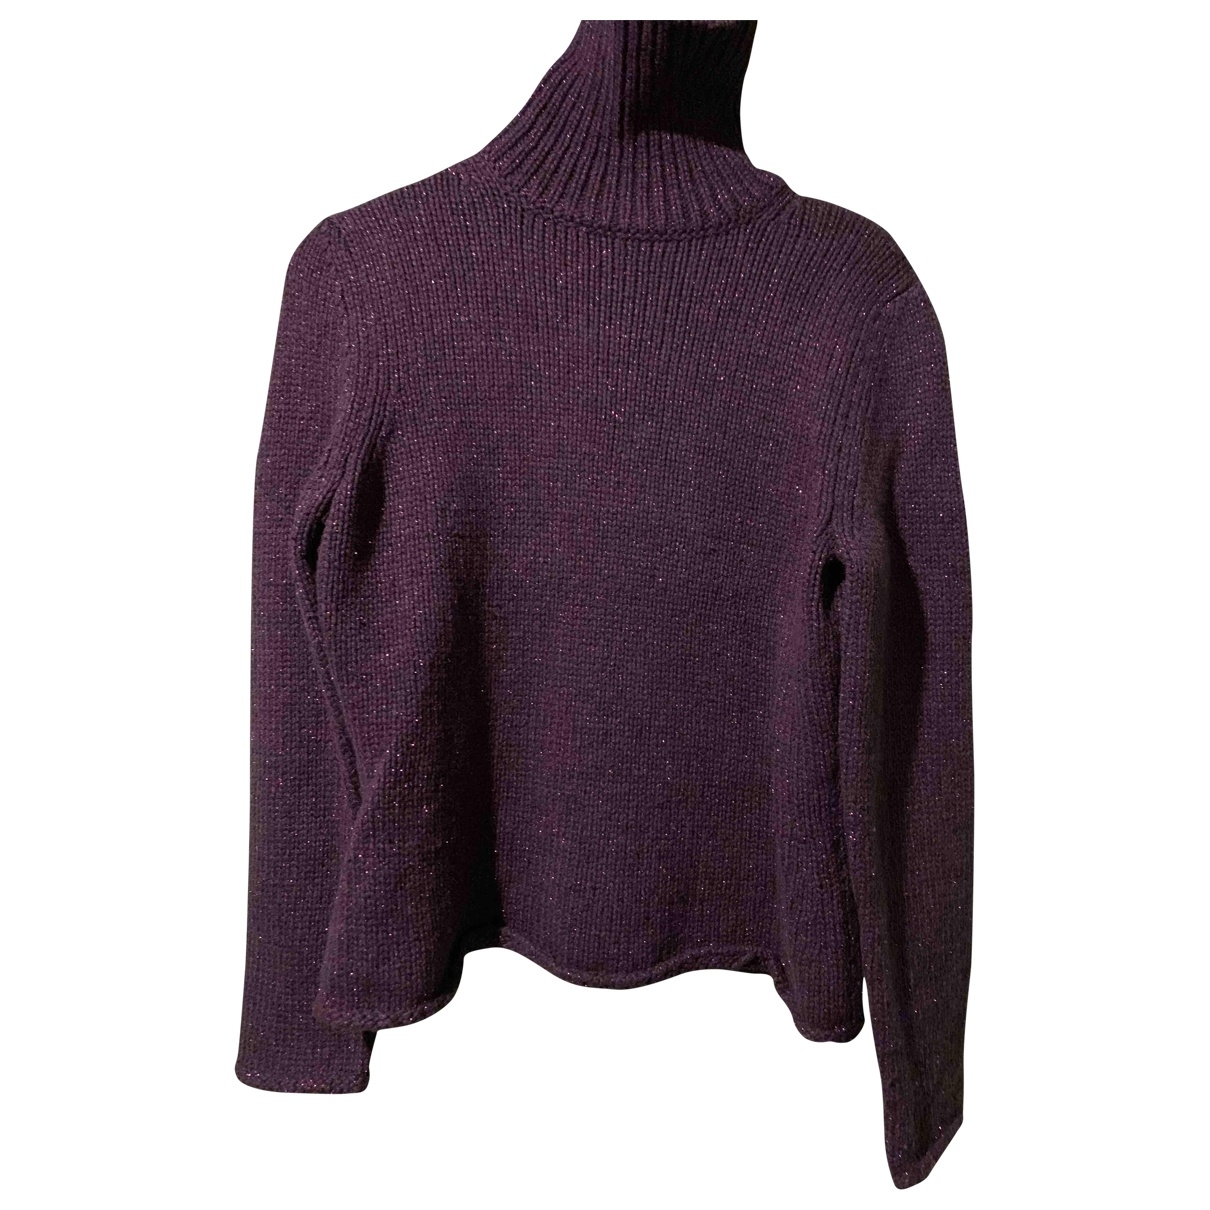 Gerard Darel - Pull   pour femme en laine - violet